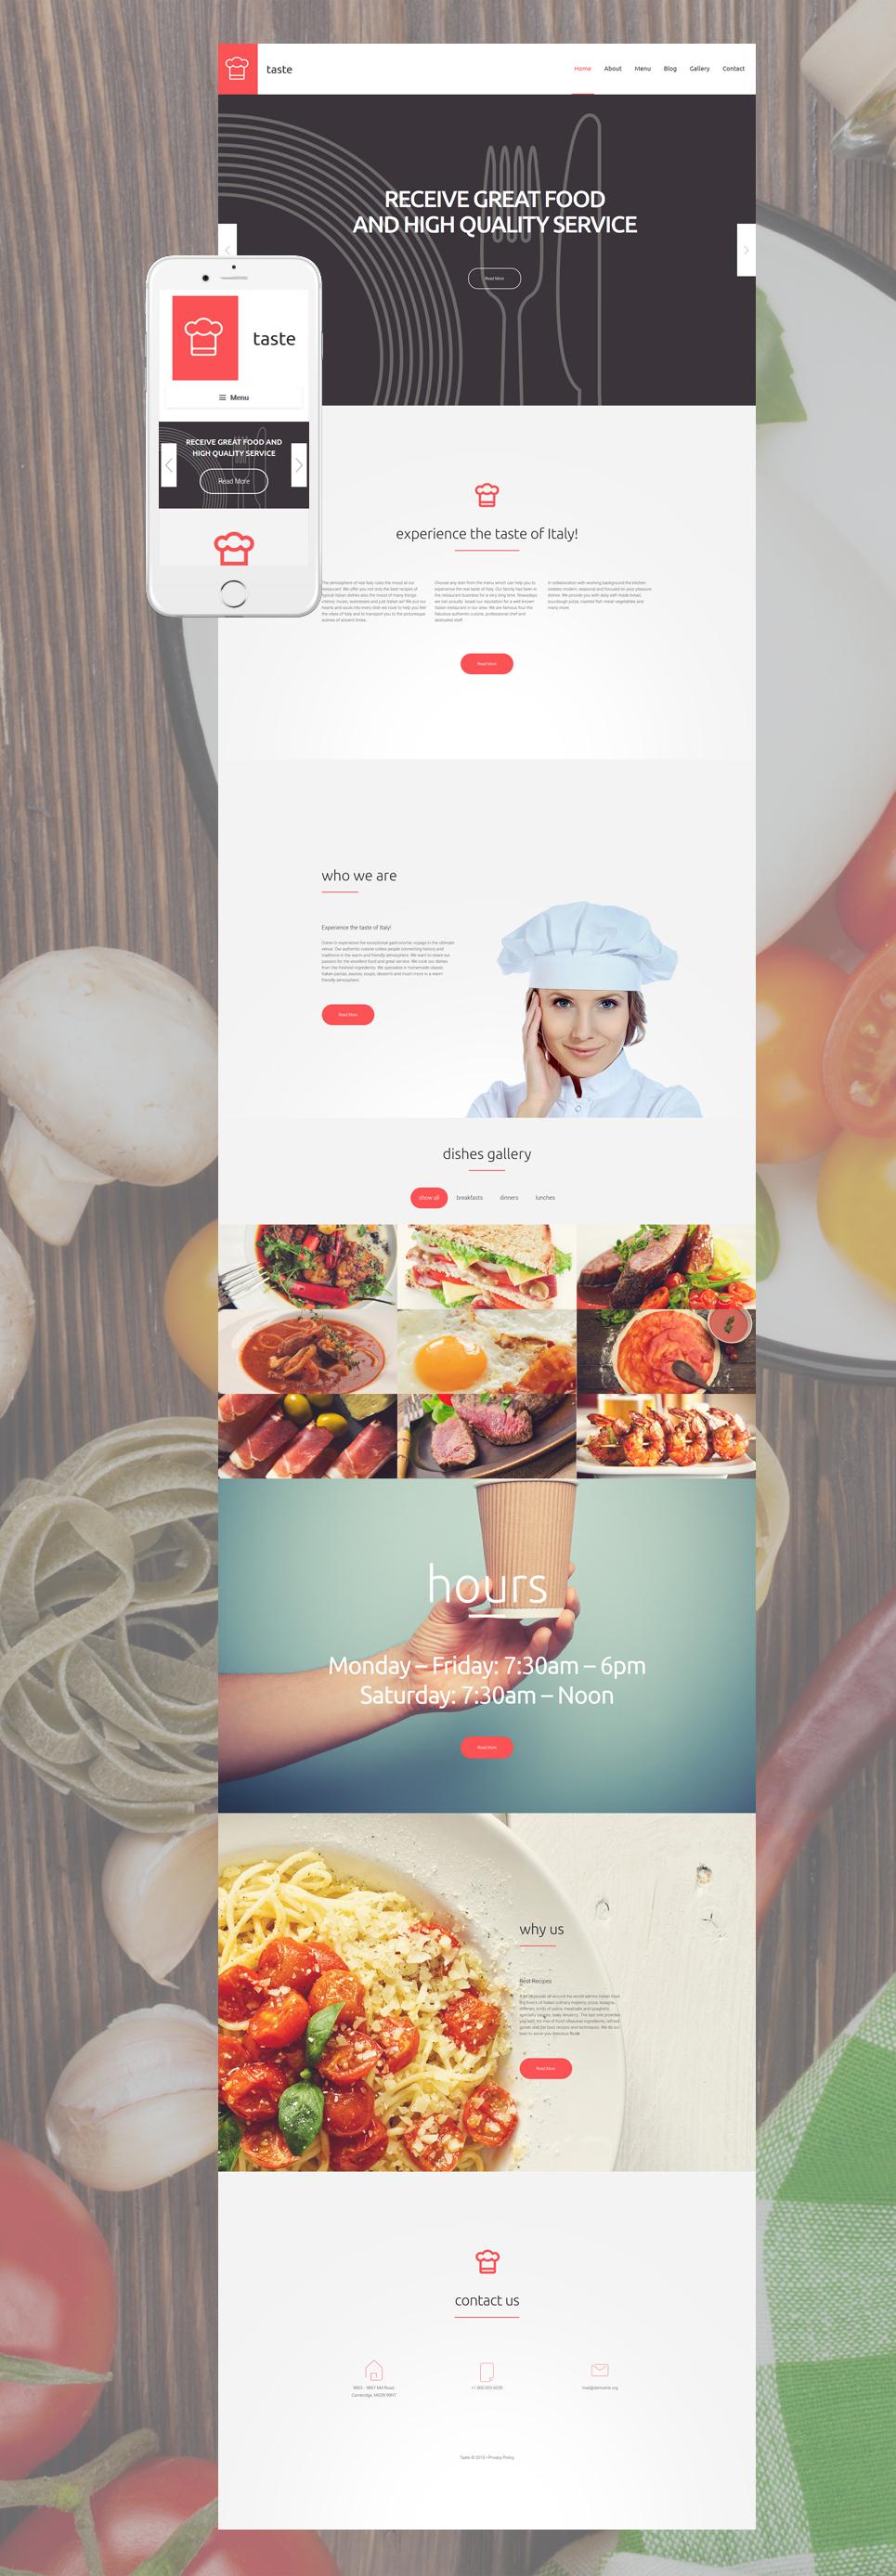 Taste - Best Premium Responsive Cafe & Restaurant WordPress Theme